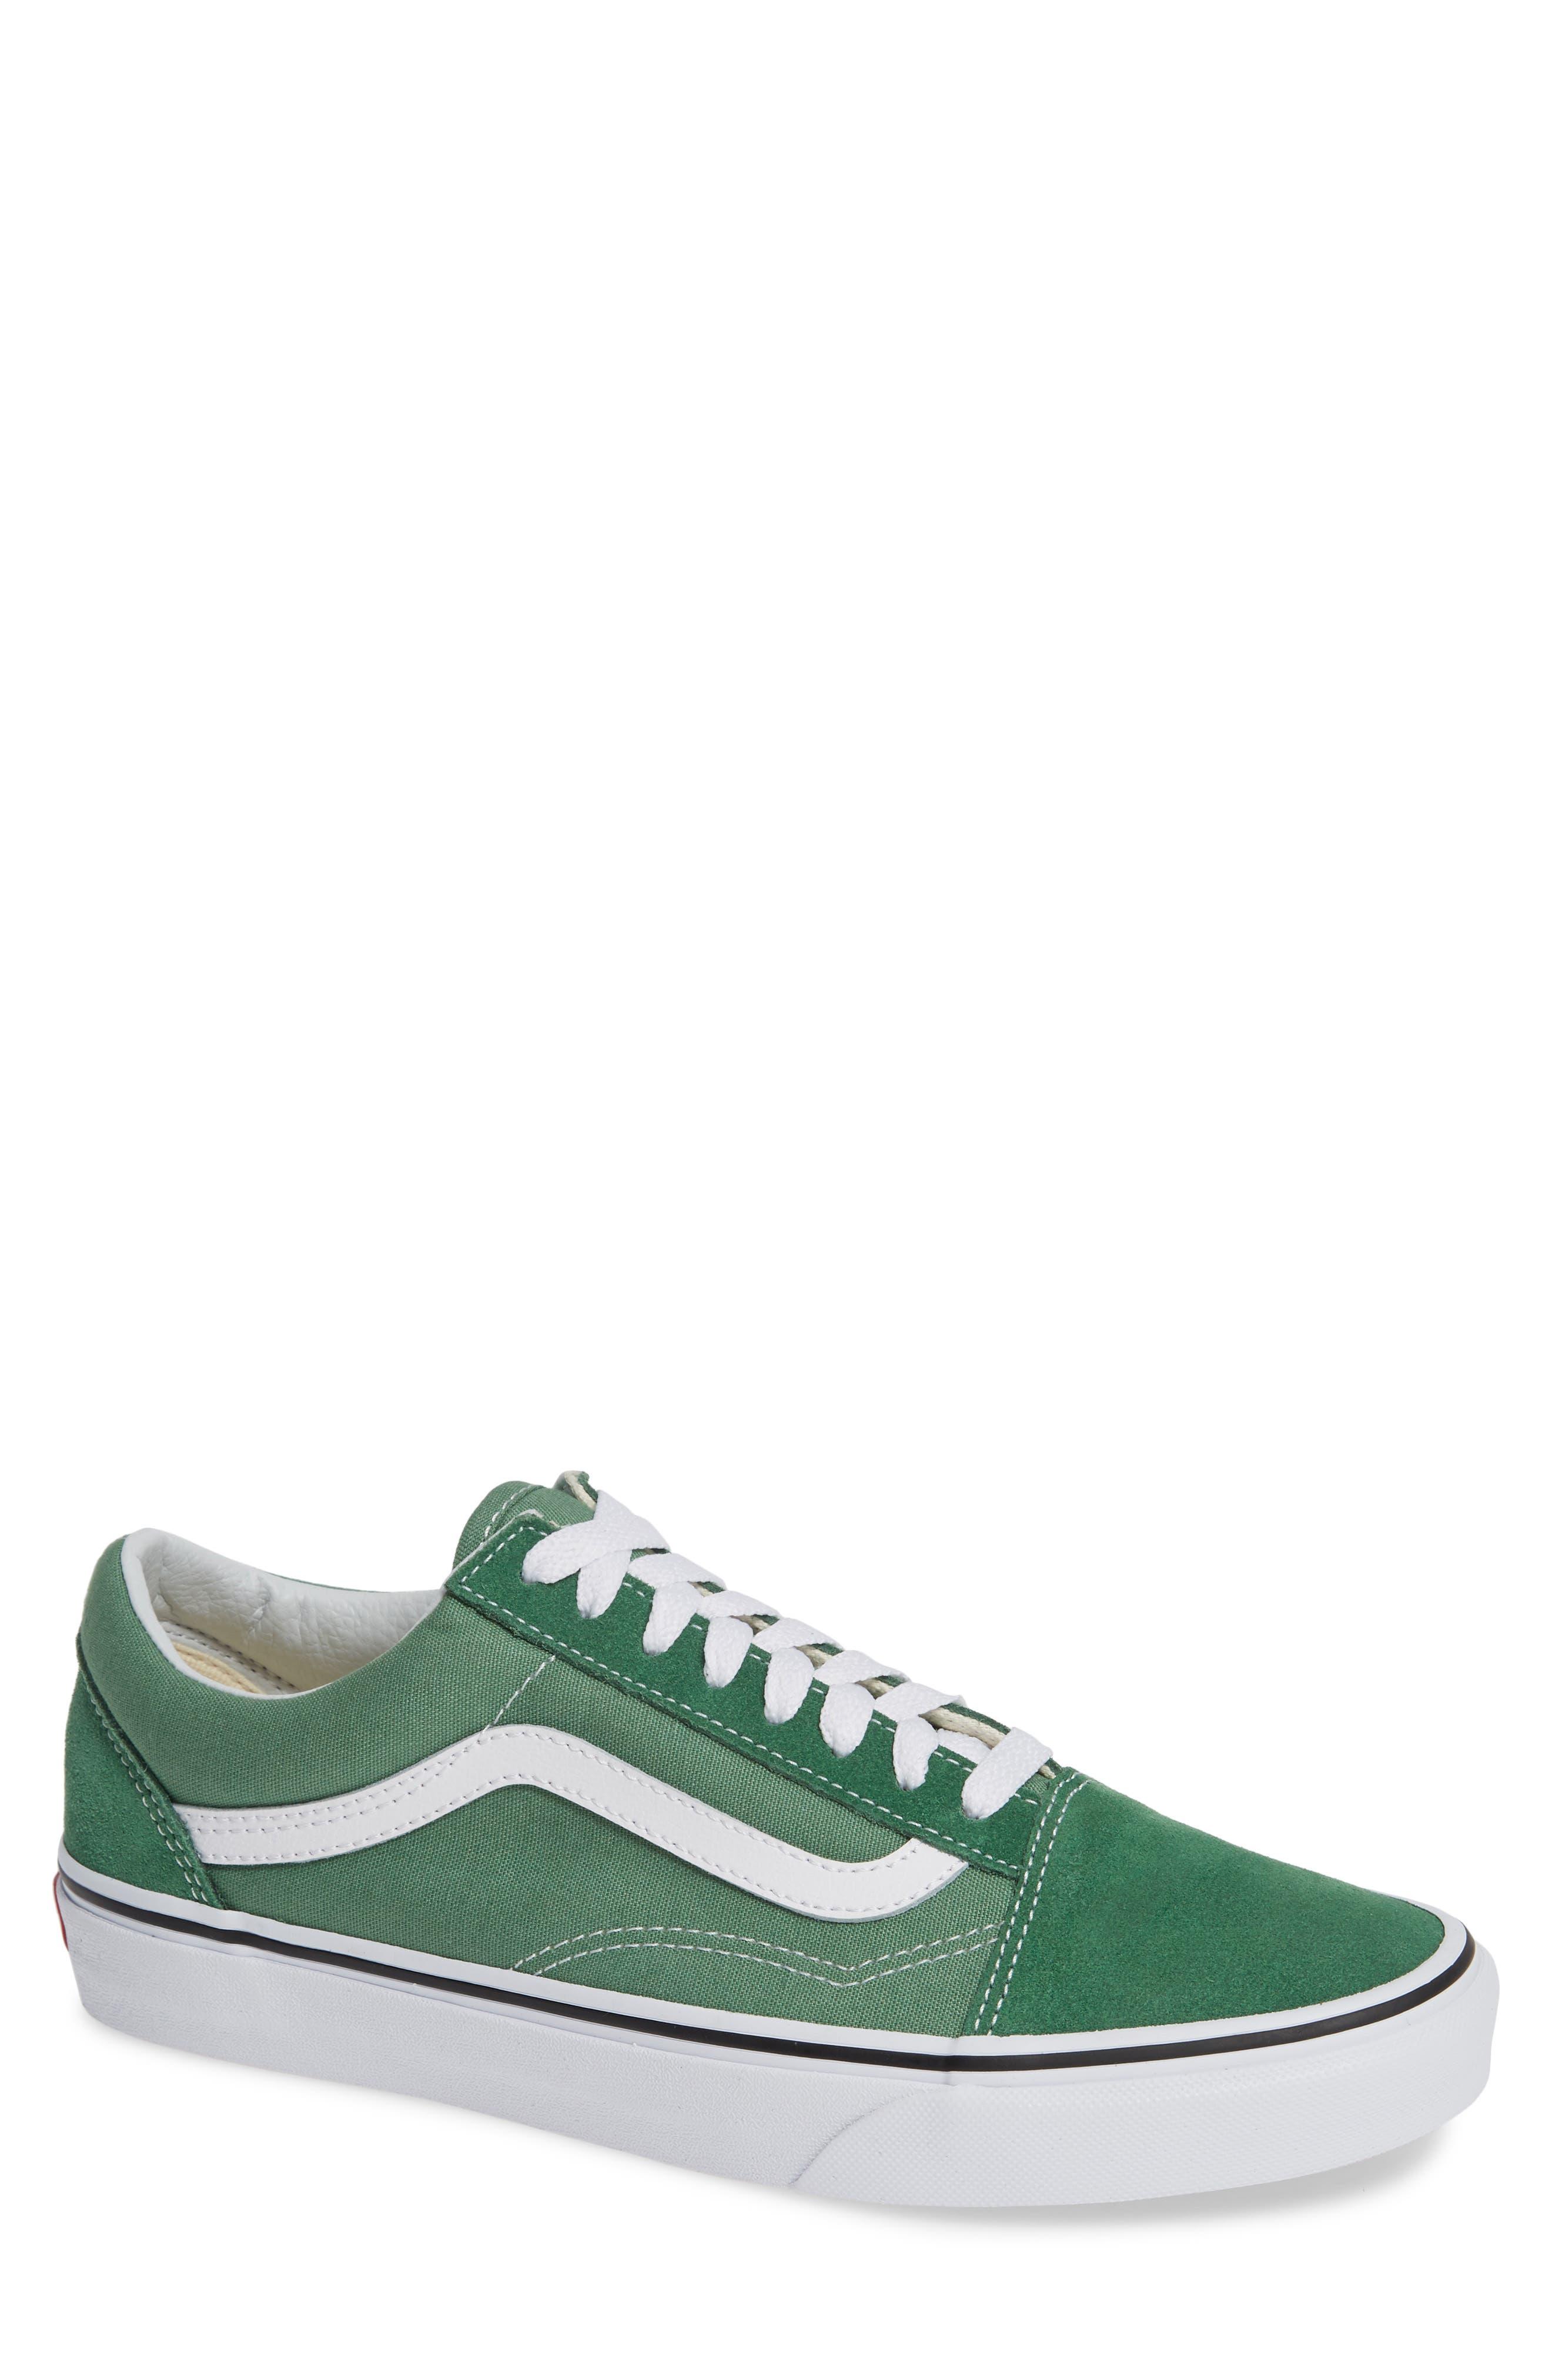 'Old Skool' Sneaker,                         Main,                         color, DEEP GRASS GREEN/ TRUE WHITE